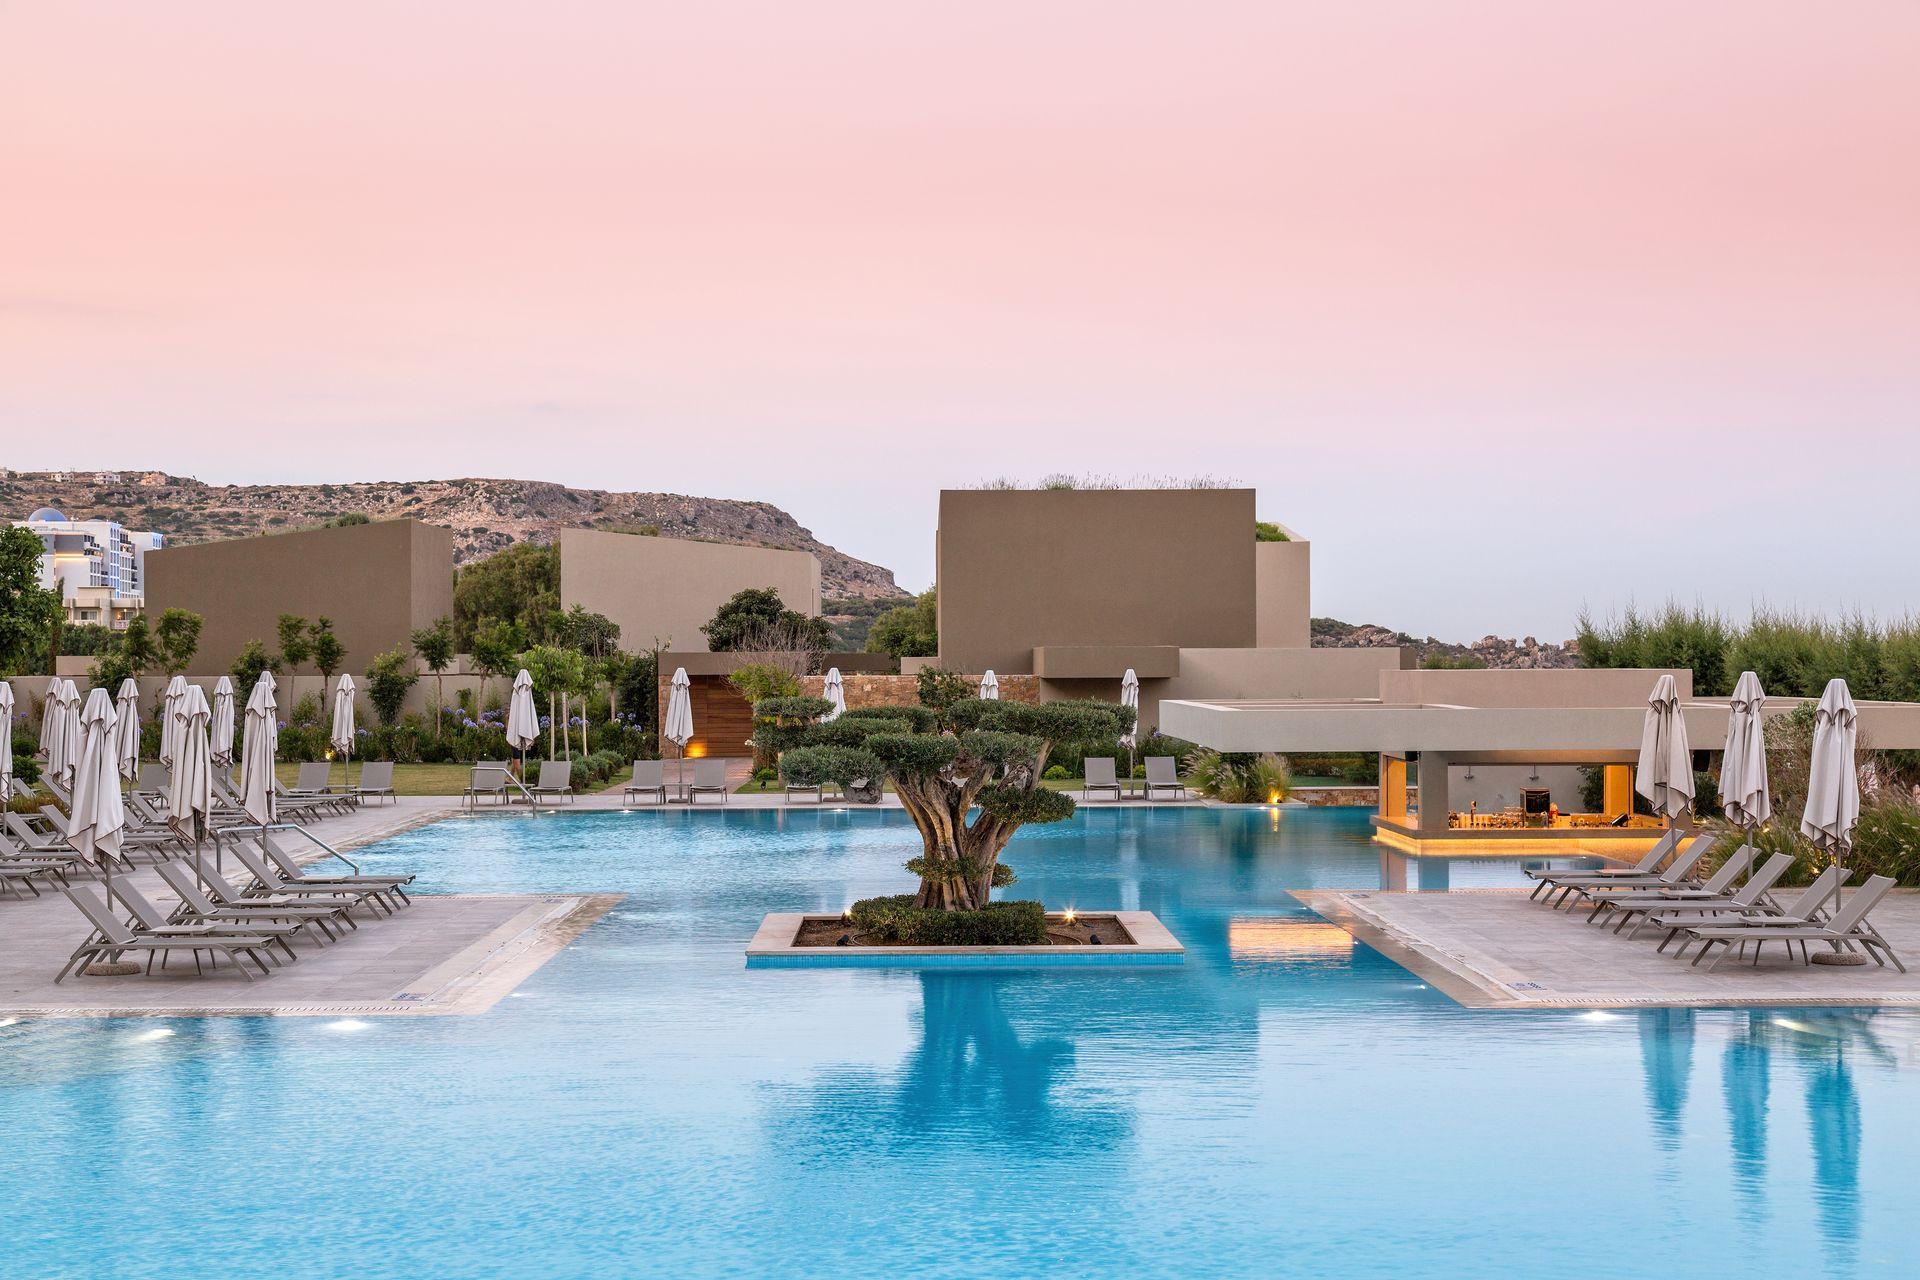 5* Amada Colossos Resort - Φαληράκι, Ρόδος ✦ 2 Ημέρες (1 Διανυκτέρευση) ✦ 2 άτομα + 1 παιδί έως 12 ετών ✦ Πρωινό ✦ 01/07/2021 έως 31/08/2021 ✦ Μπροστά στην Παραλία!